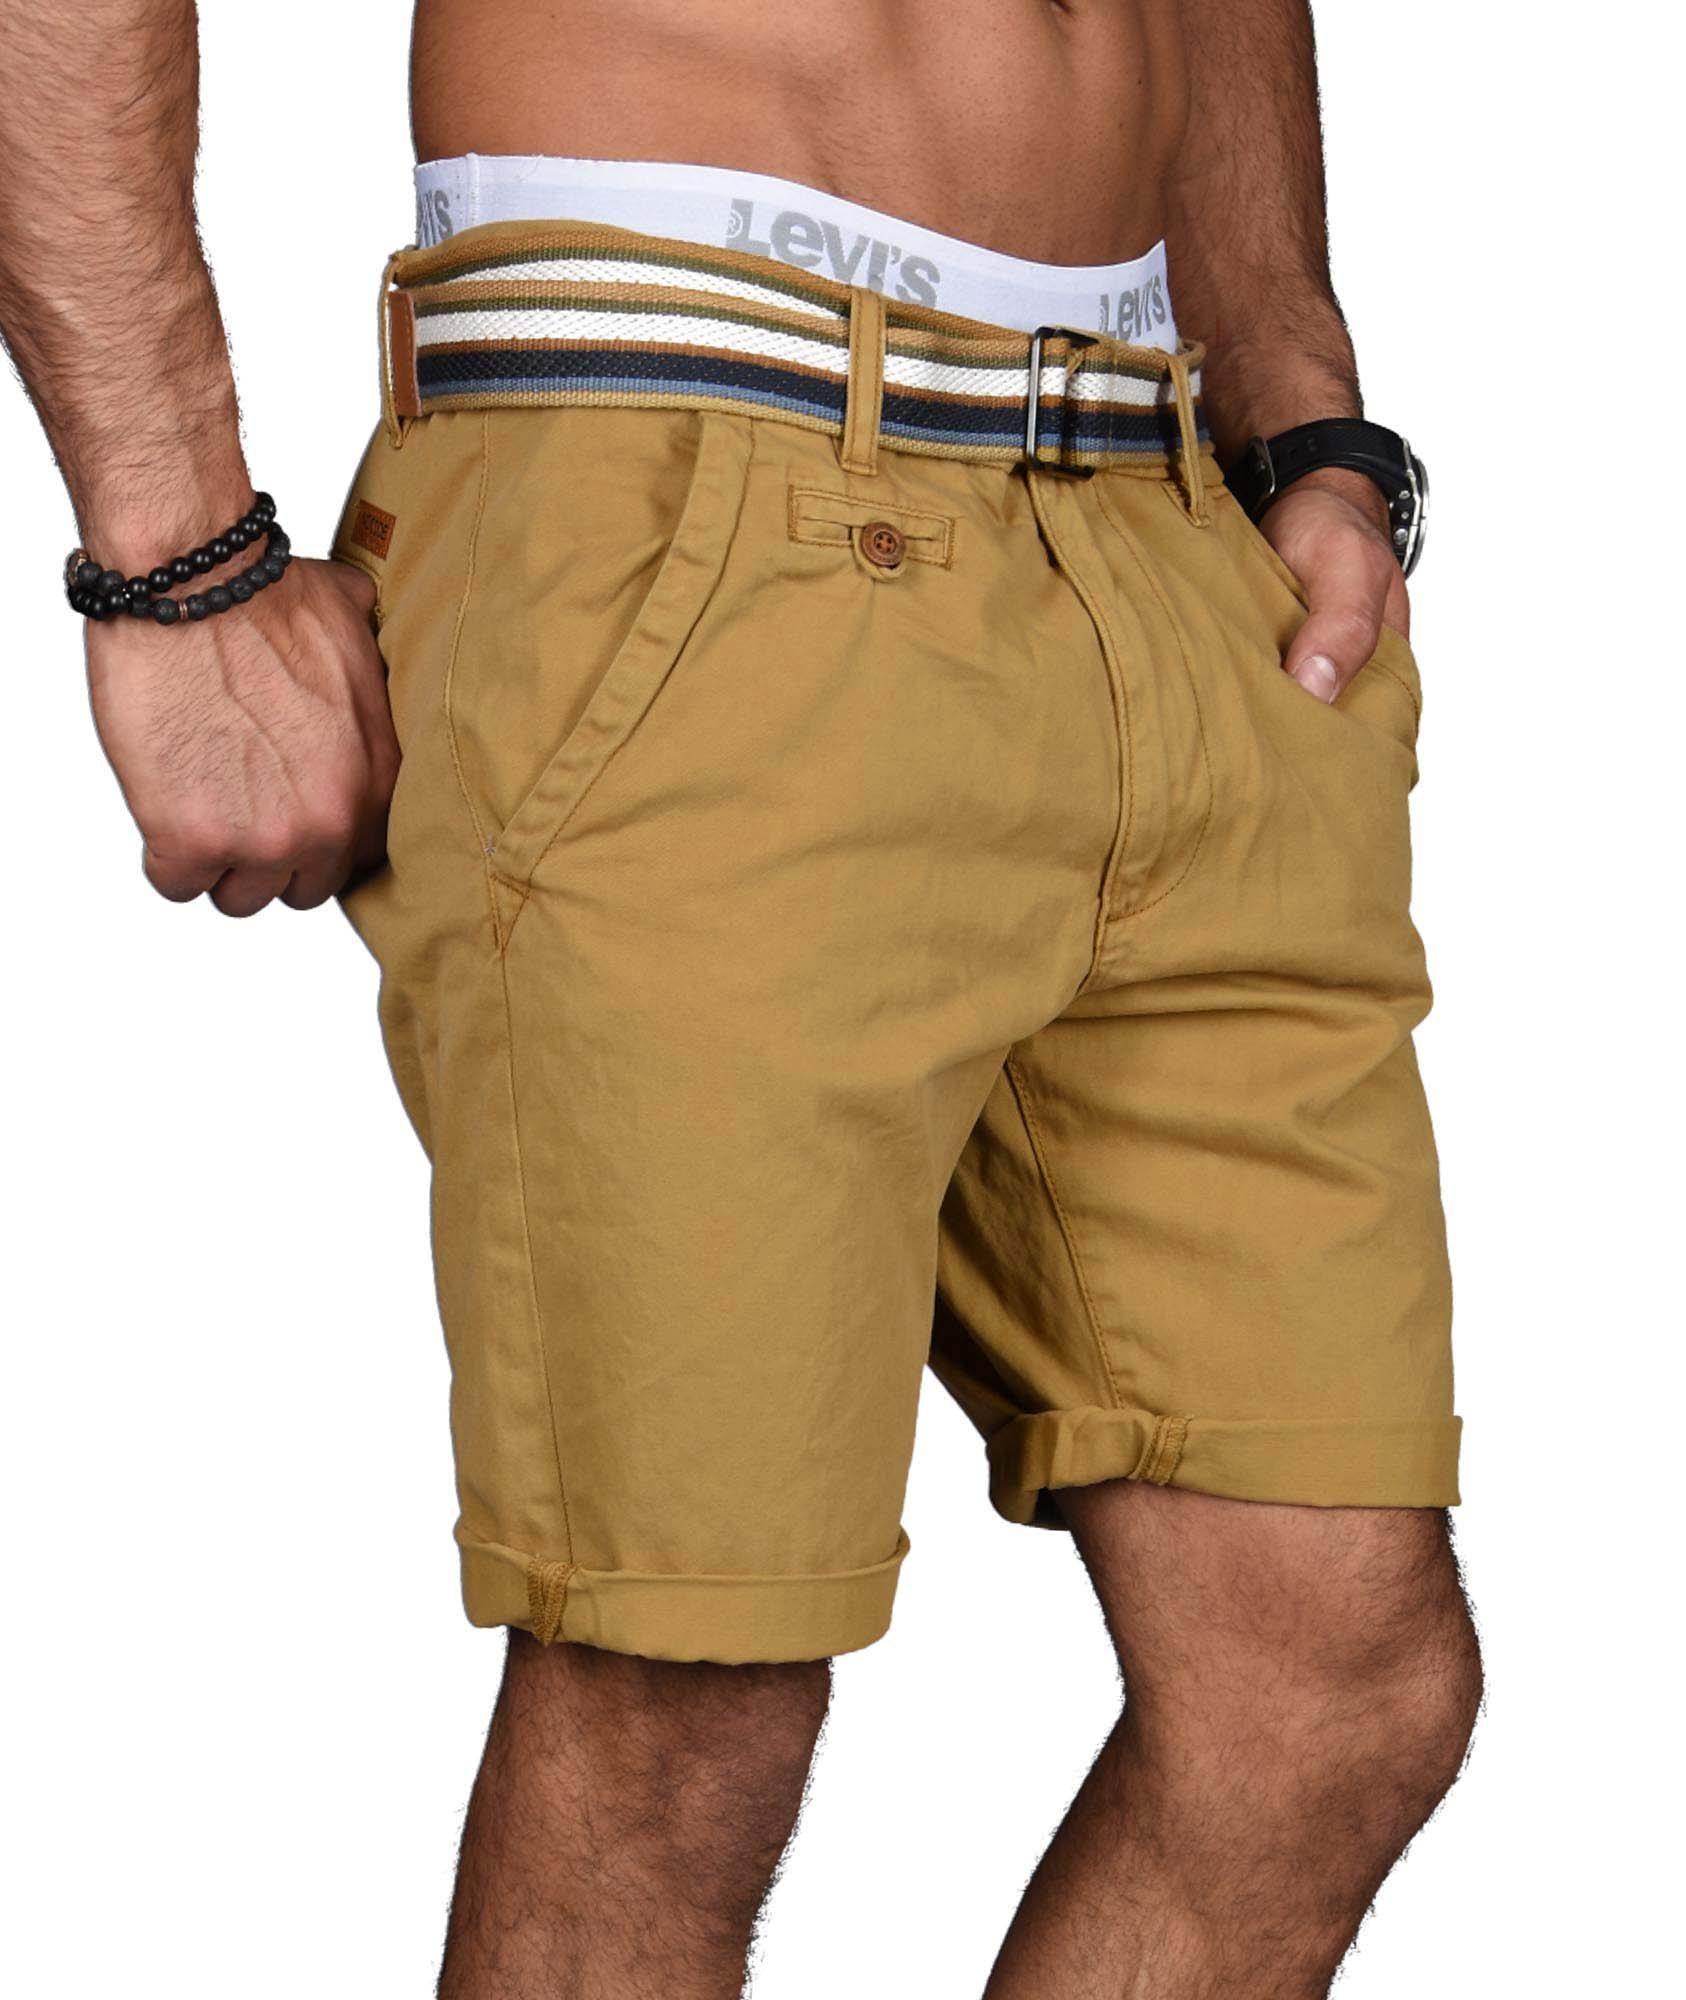 Indicode-Herren-Sommer-Bermuda-Chino-Shorts-kurze-Hose-Sommerhose-Short-NEU-B499 Indexbild 7